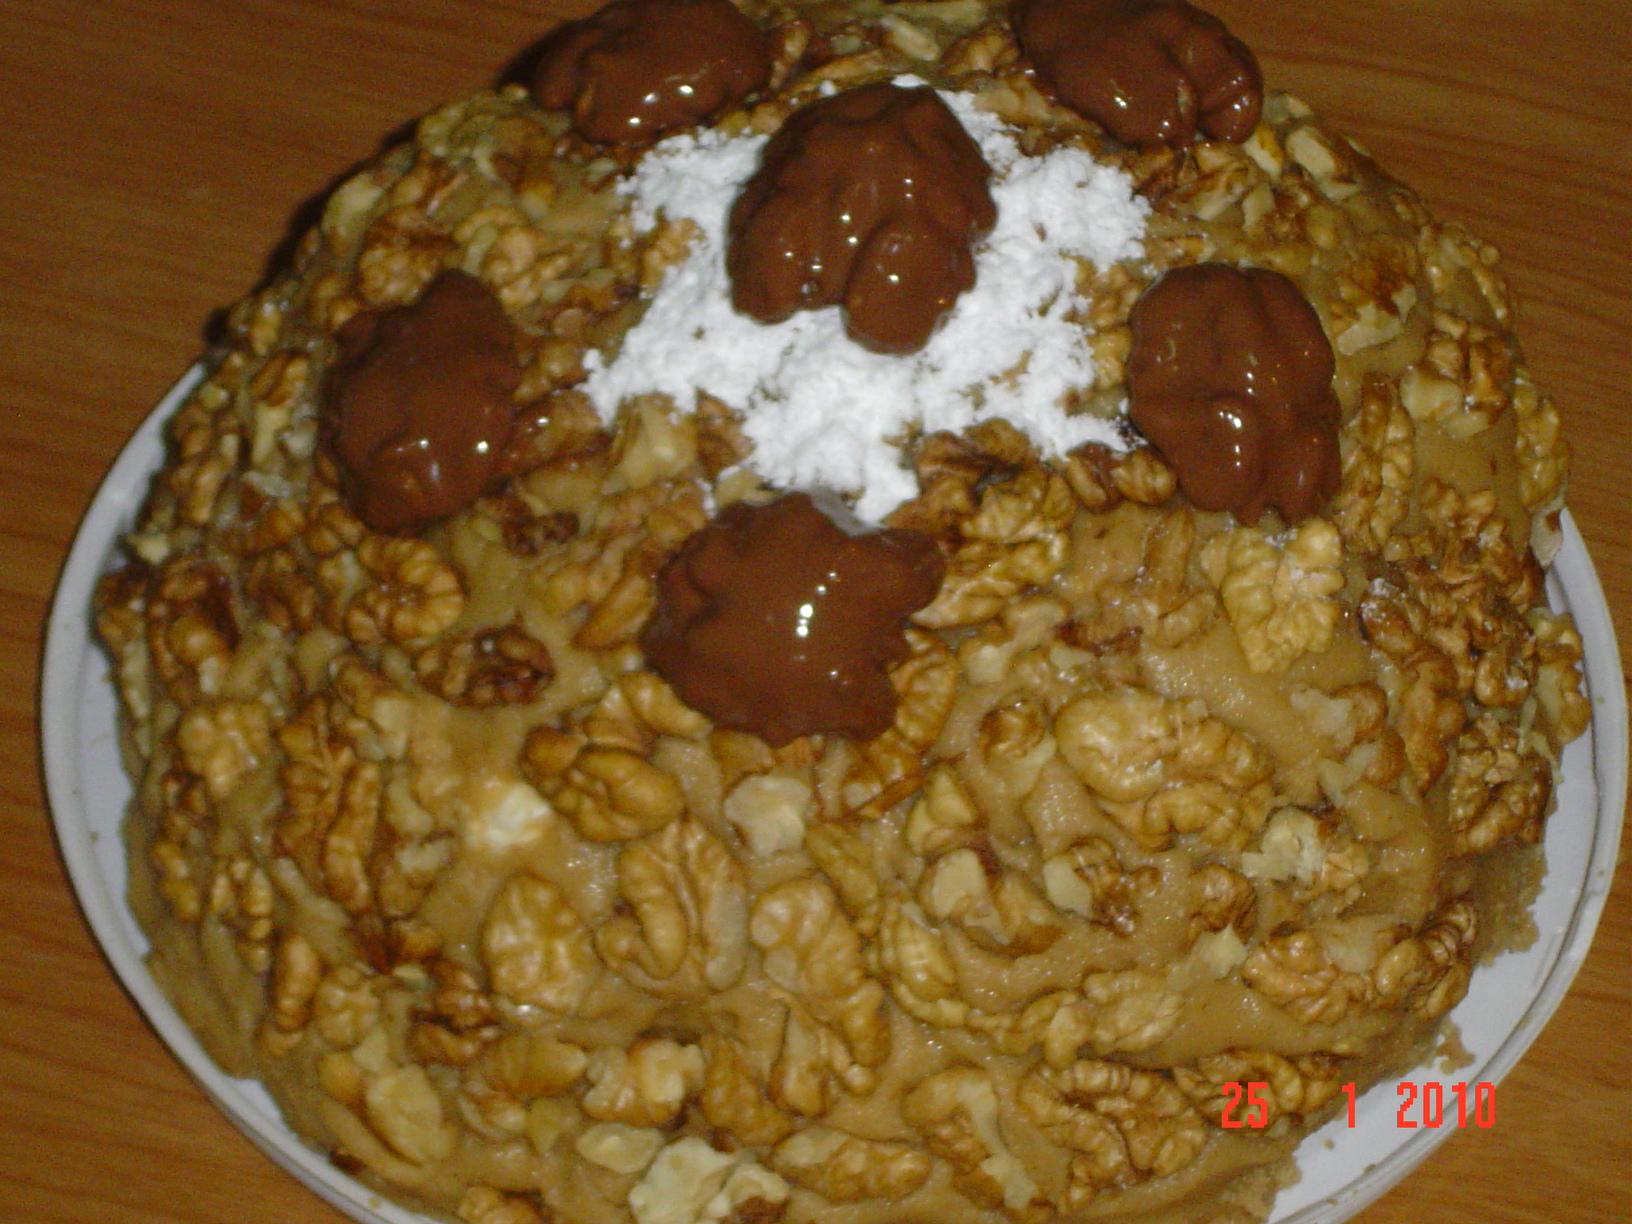 Торт с грецкими орехами рецепт пошагово в домашних условиях